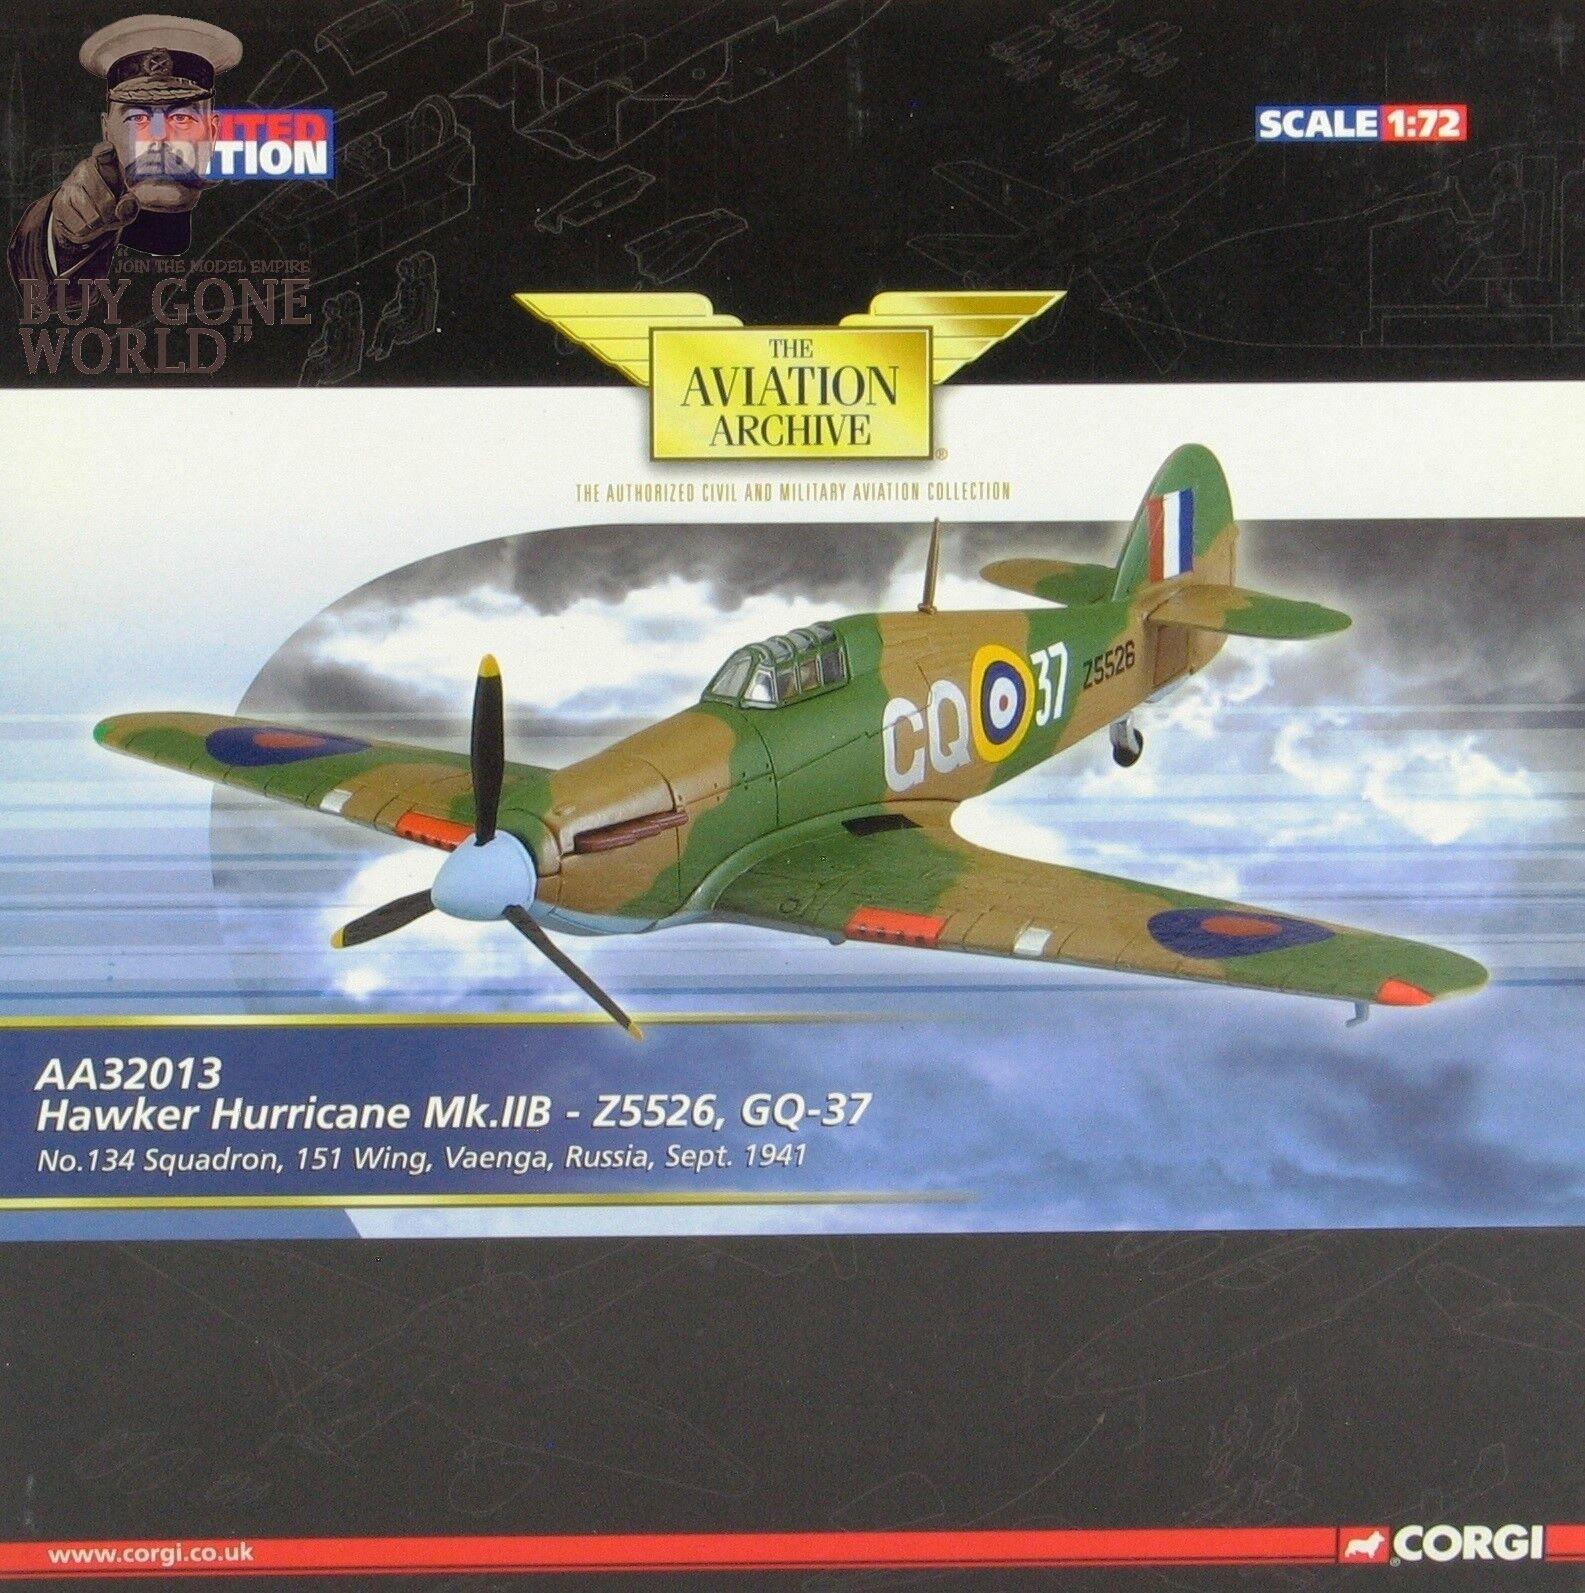 Corgi AA32018 Huracán Mk II No.134 Sqn, Z5226, vaenga, URSS, septiembre de 41 00031860